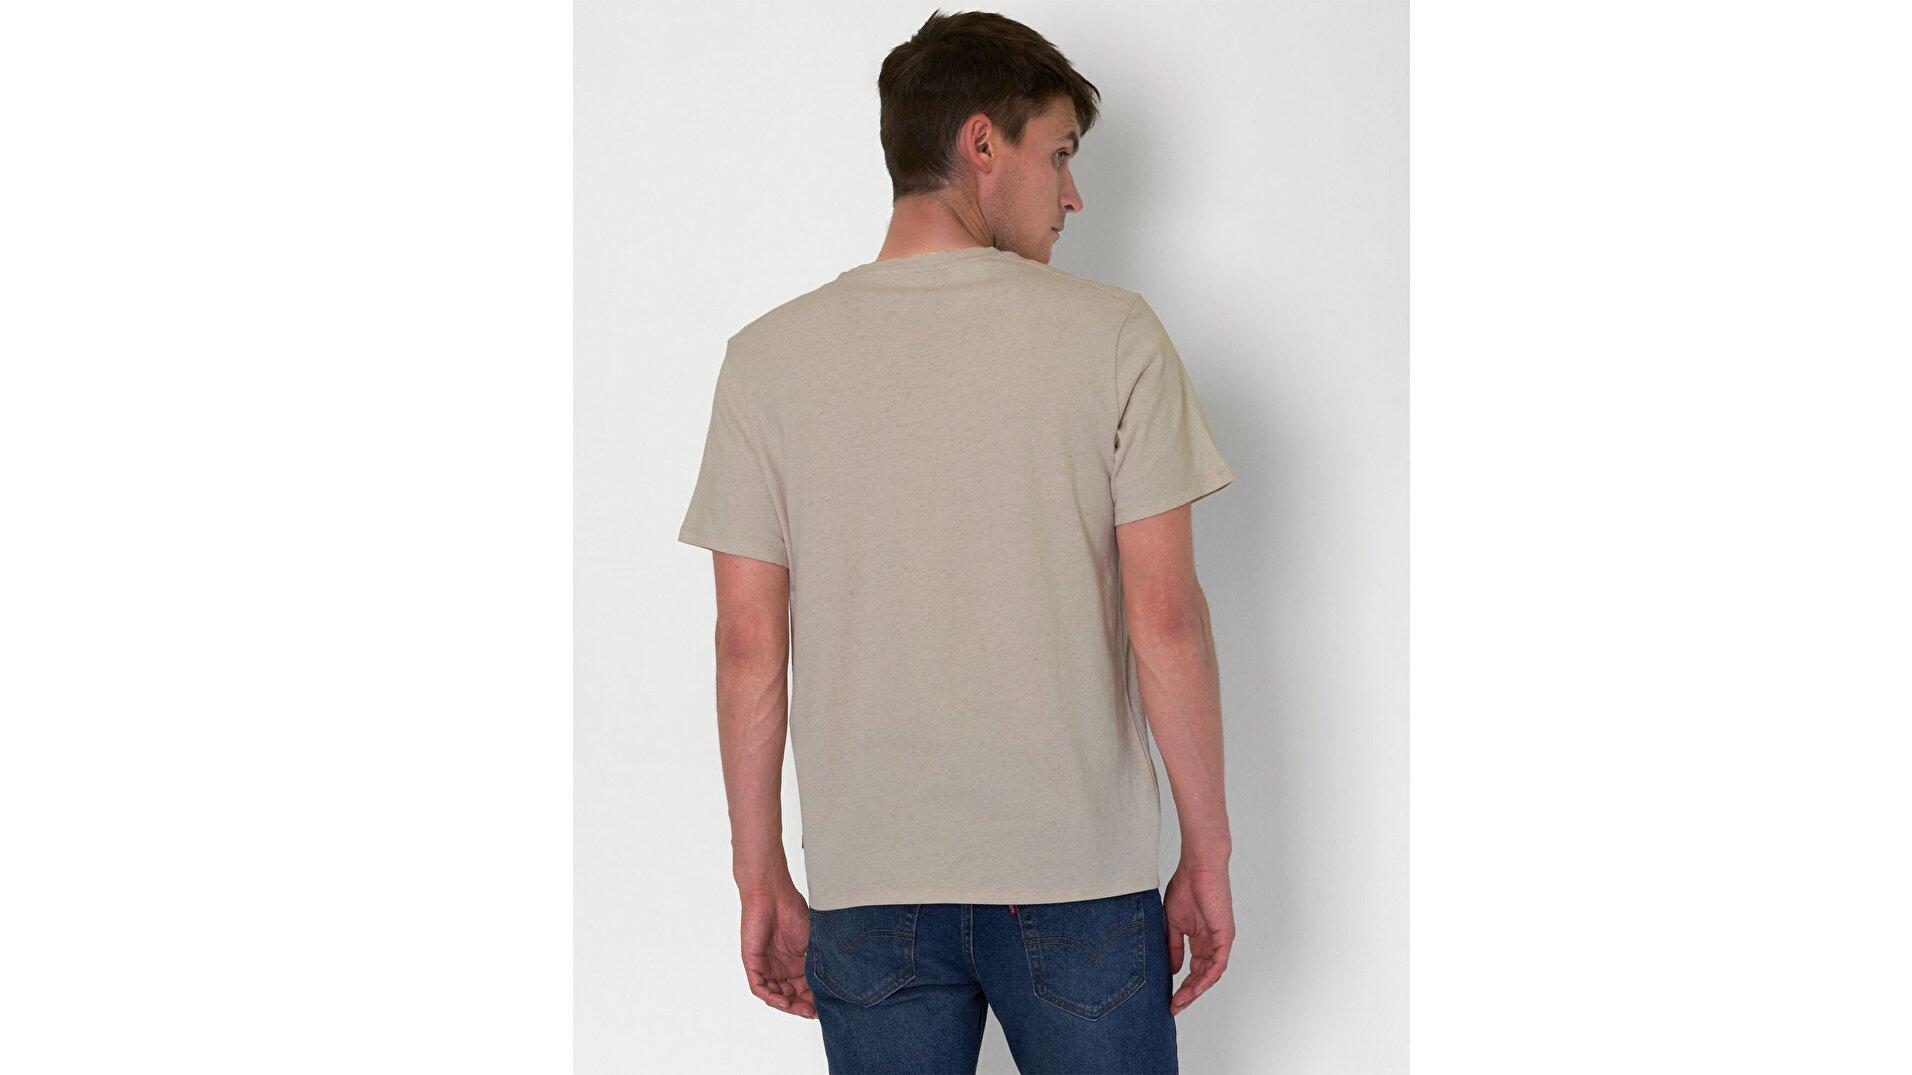 Wellthread Graphic Tee Sand Cotton Açık Kahverengi Erkek Tişört